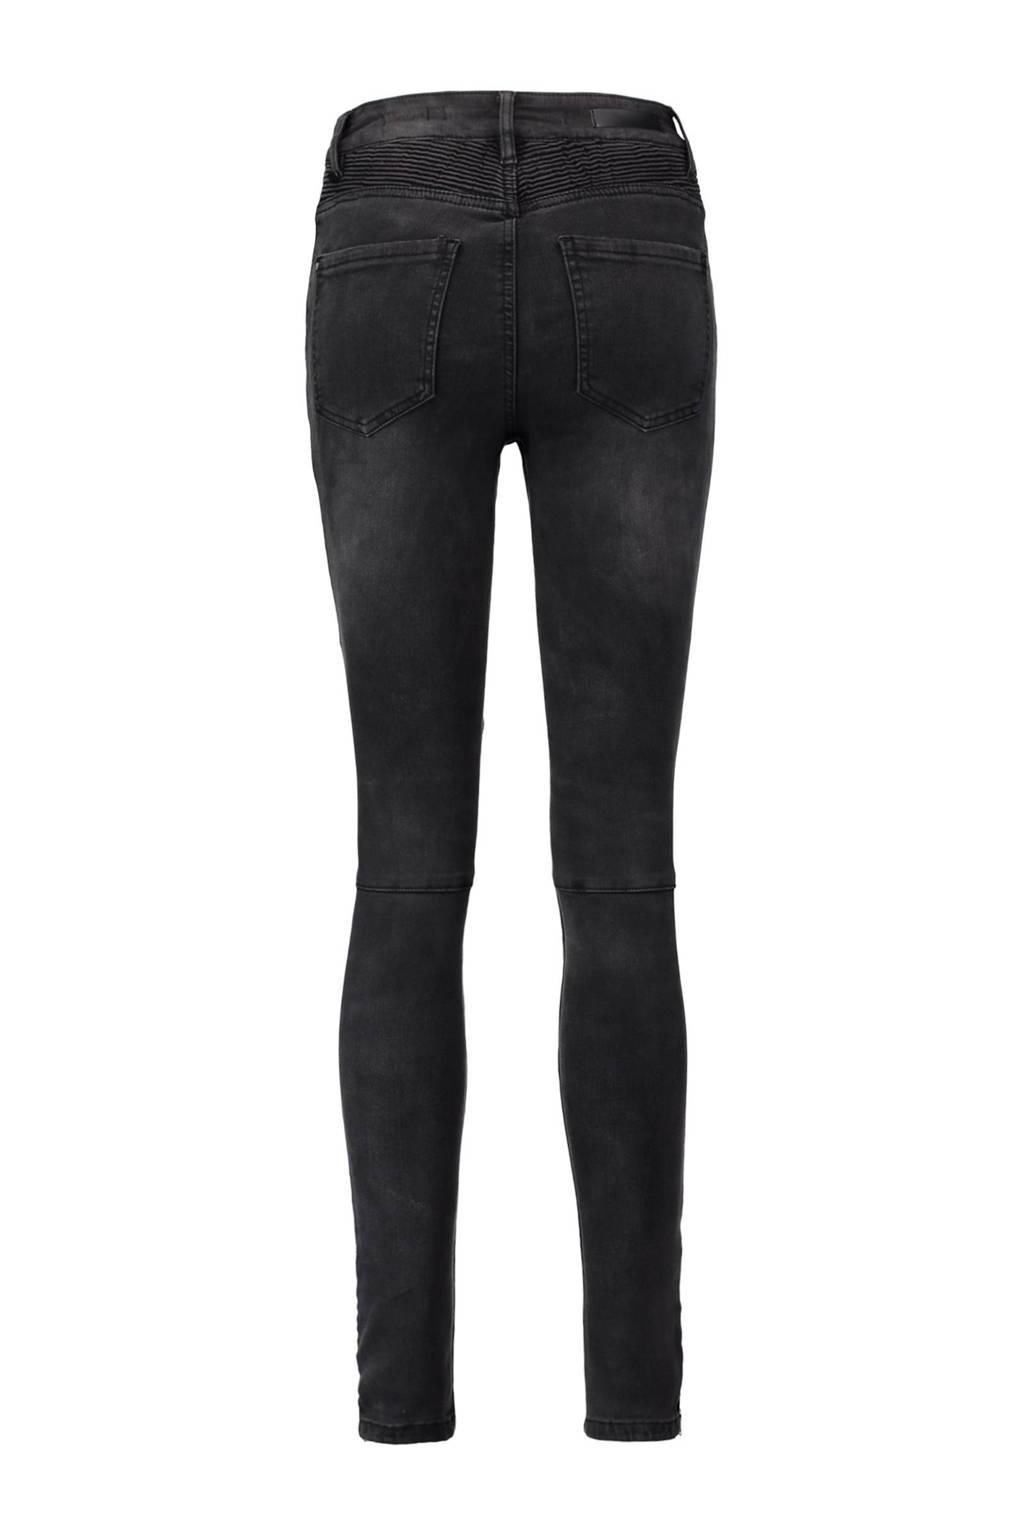 CoolCat Yfbeau skinny fit jeans, Dark denim